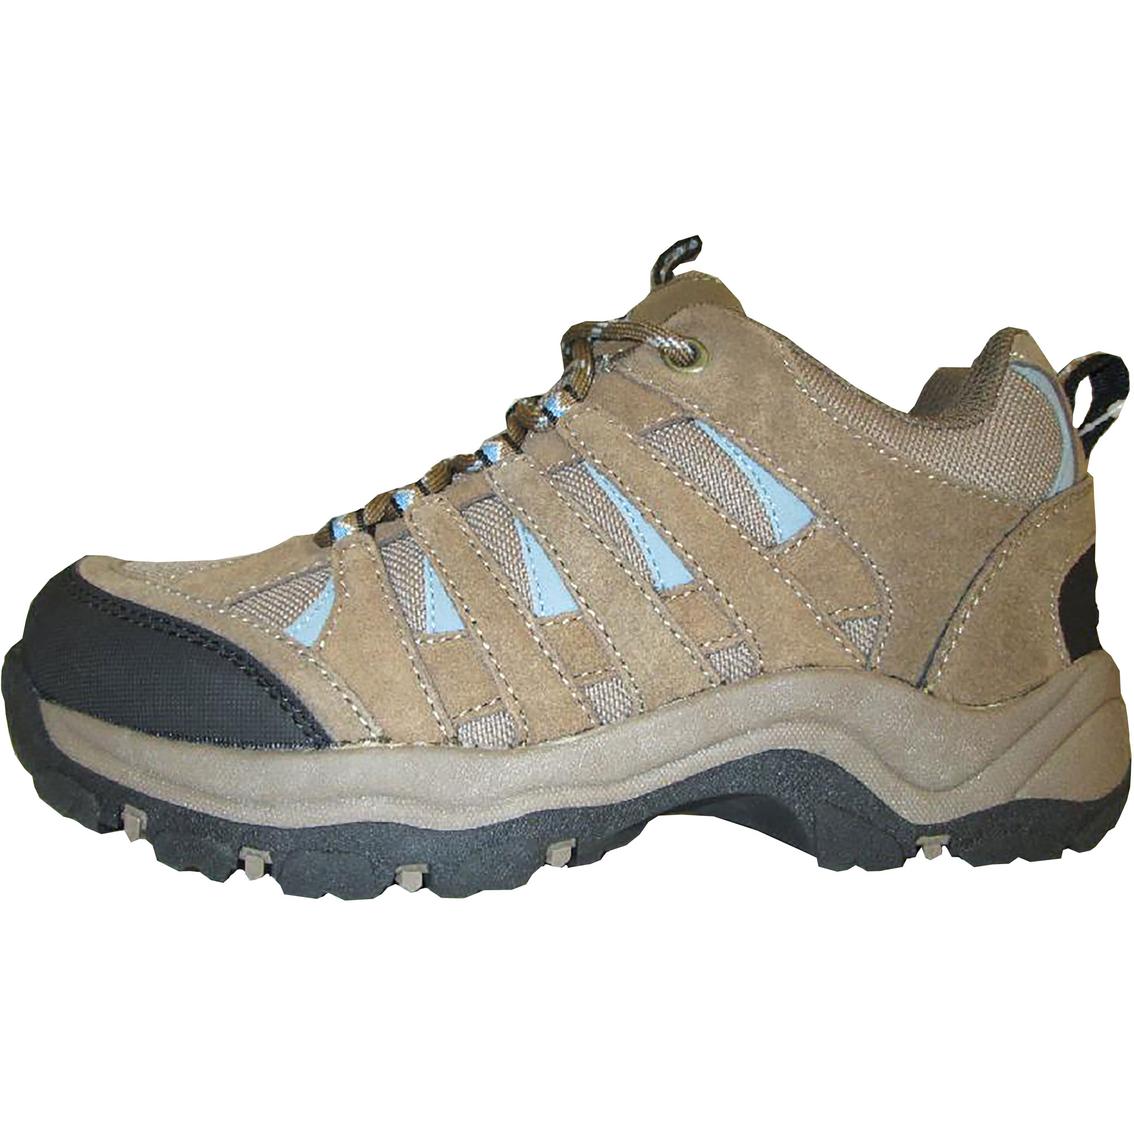 52d65c3ead26 Khombu Women s Cascade Low Quarter Hikers